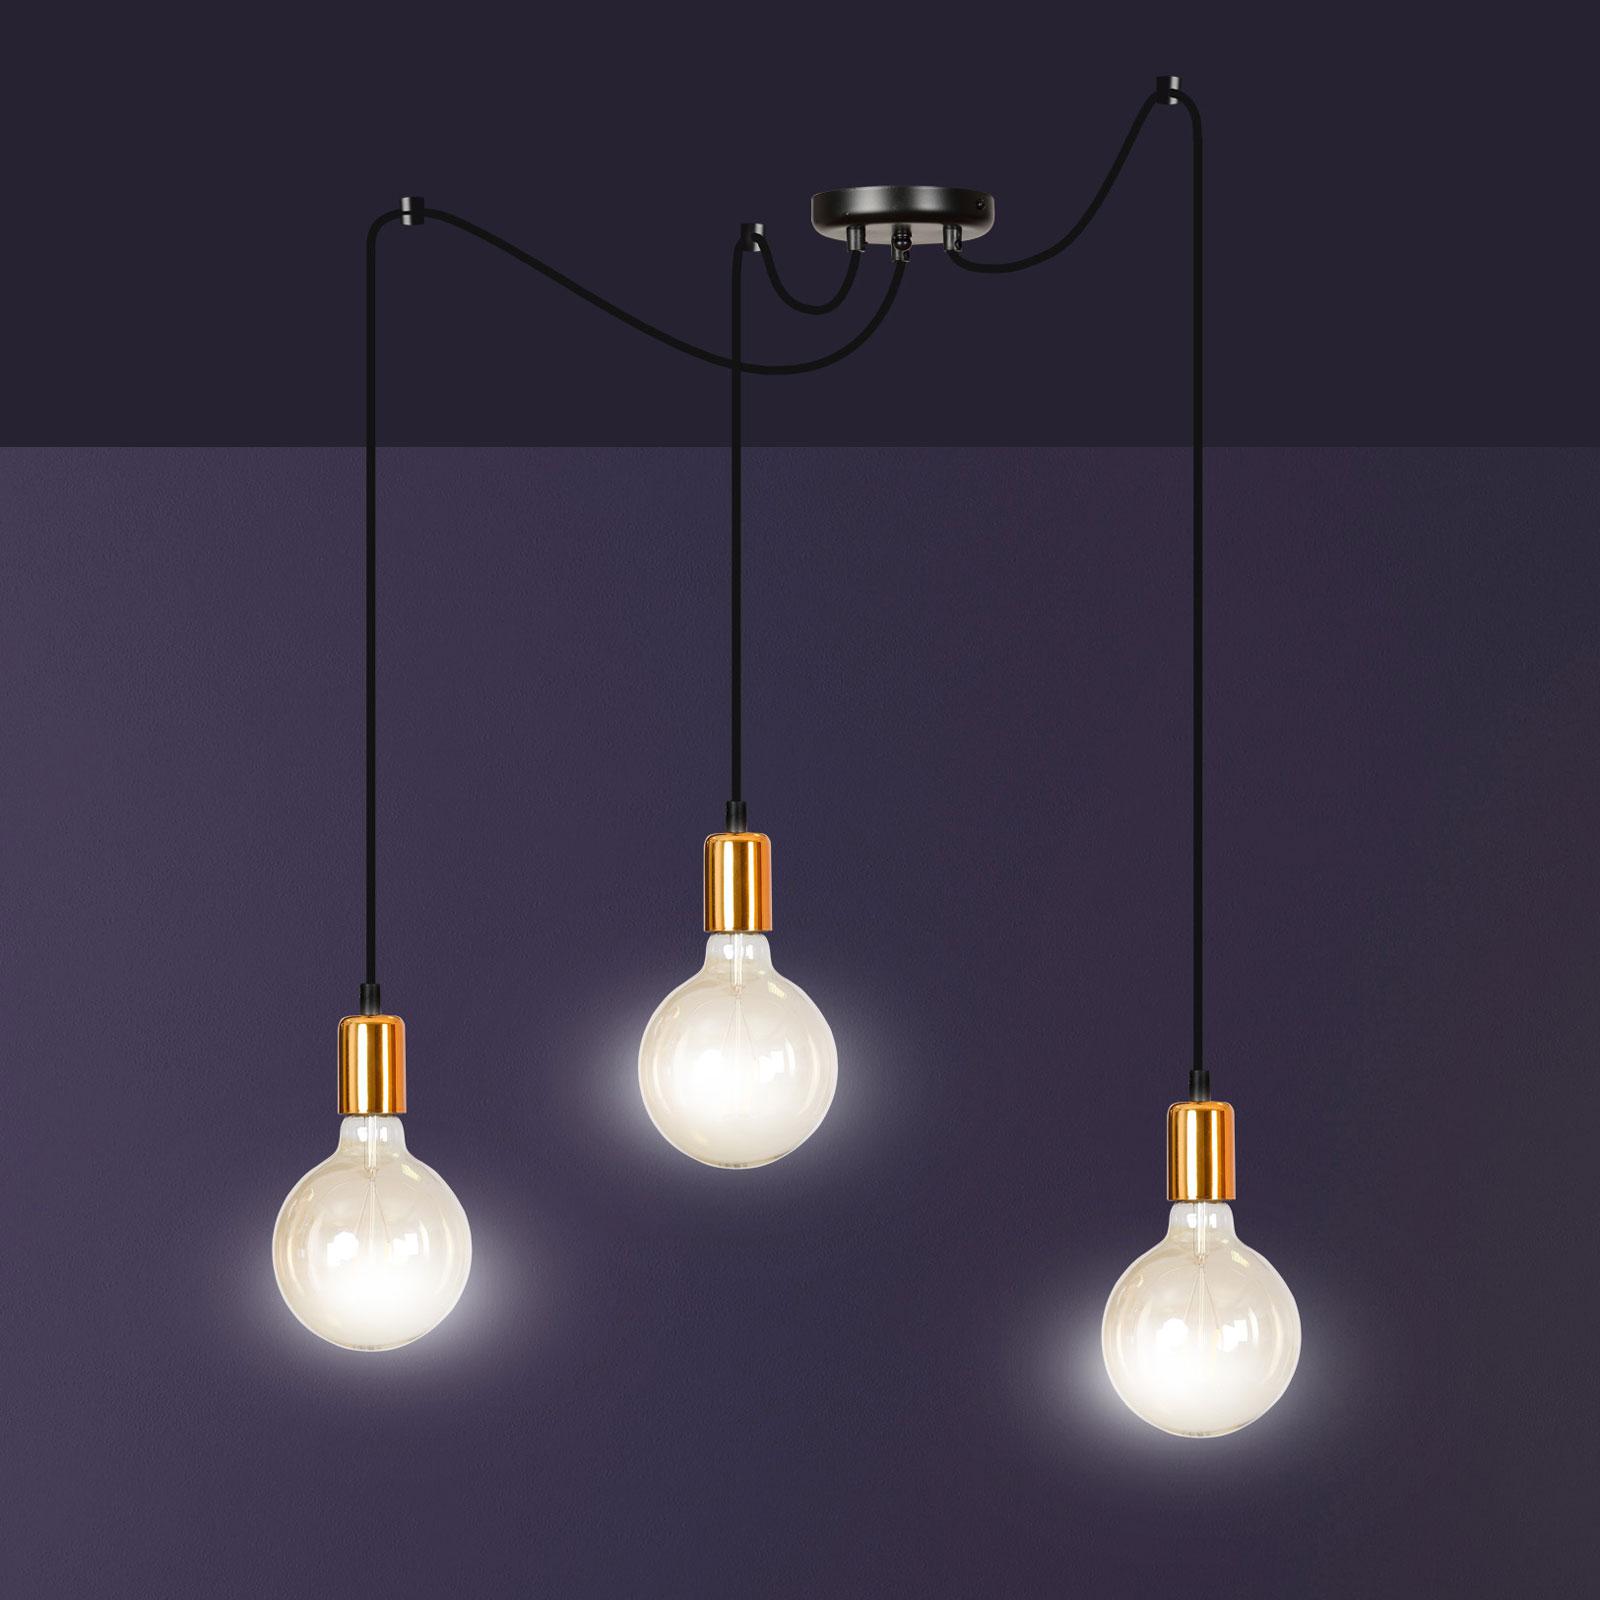 Hanglamp Spark 3 3-lamps, zwart-koper